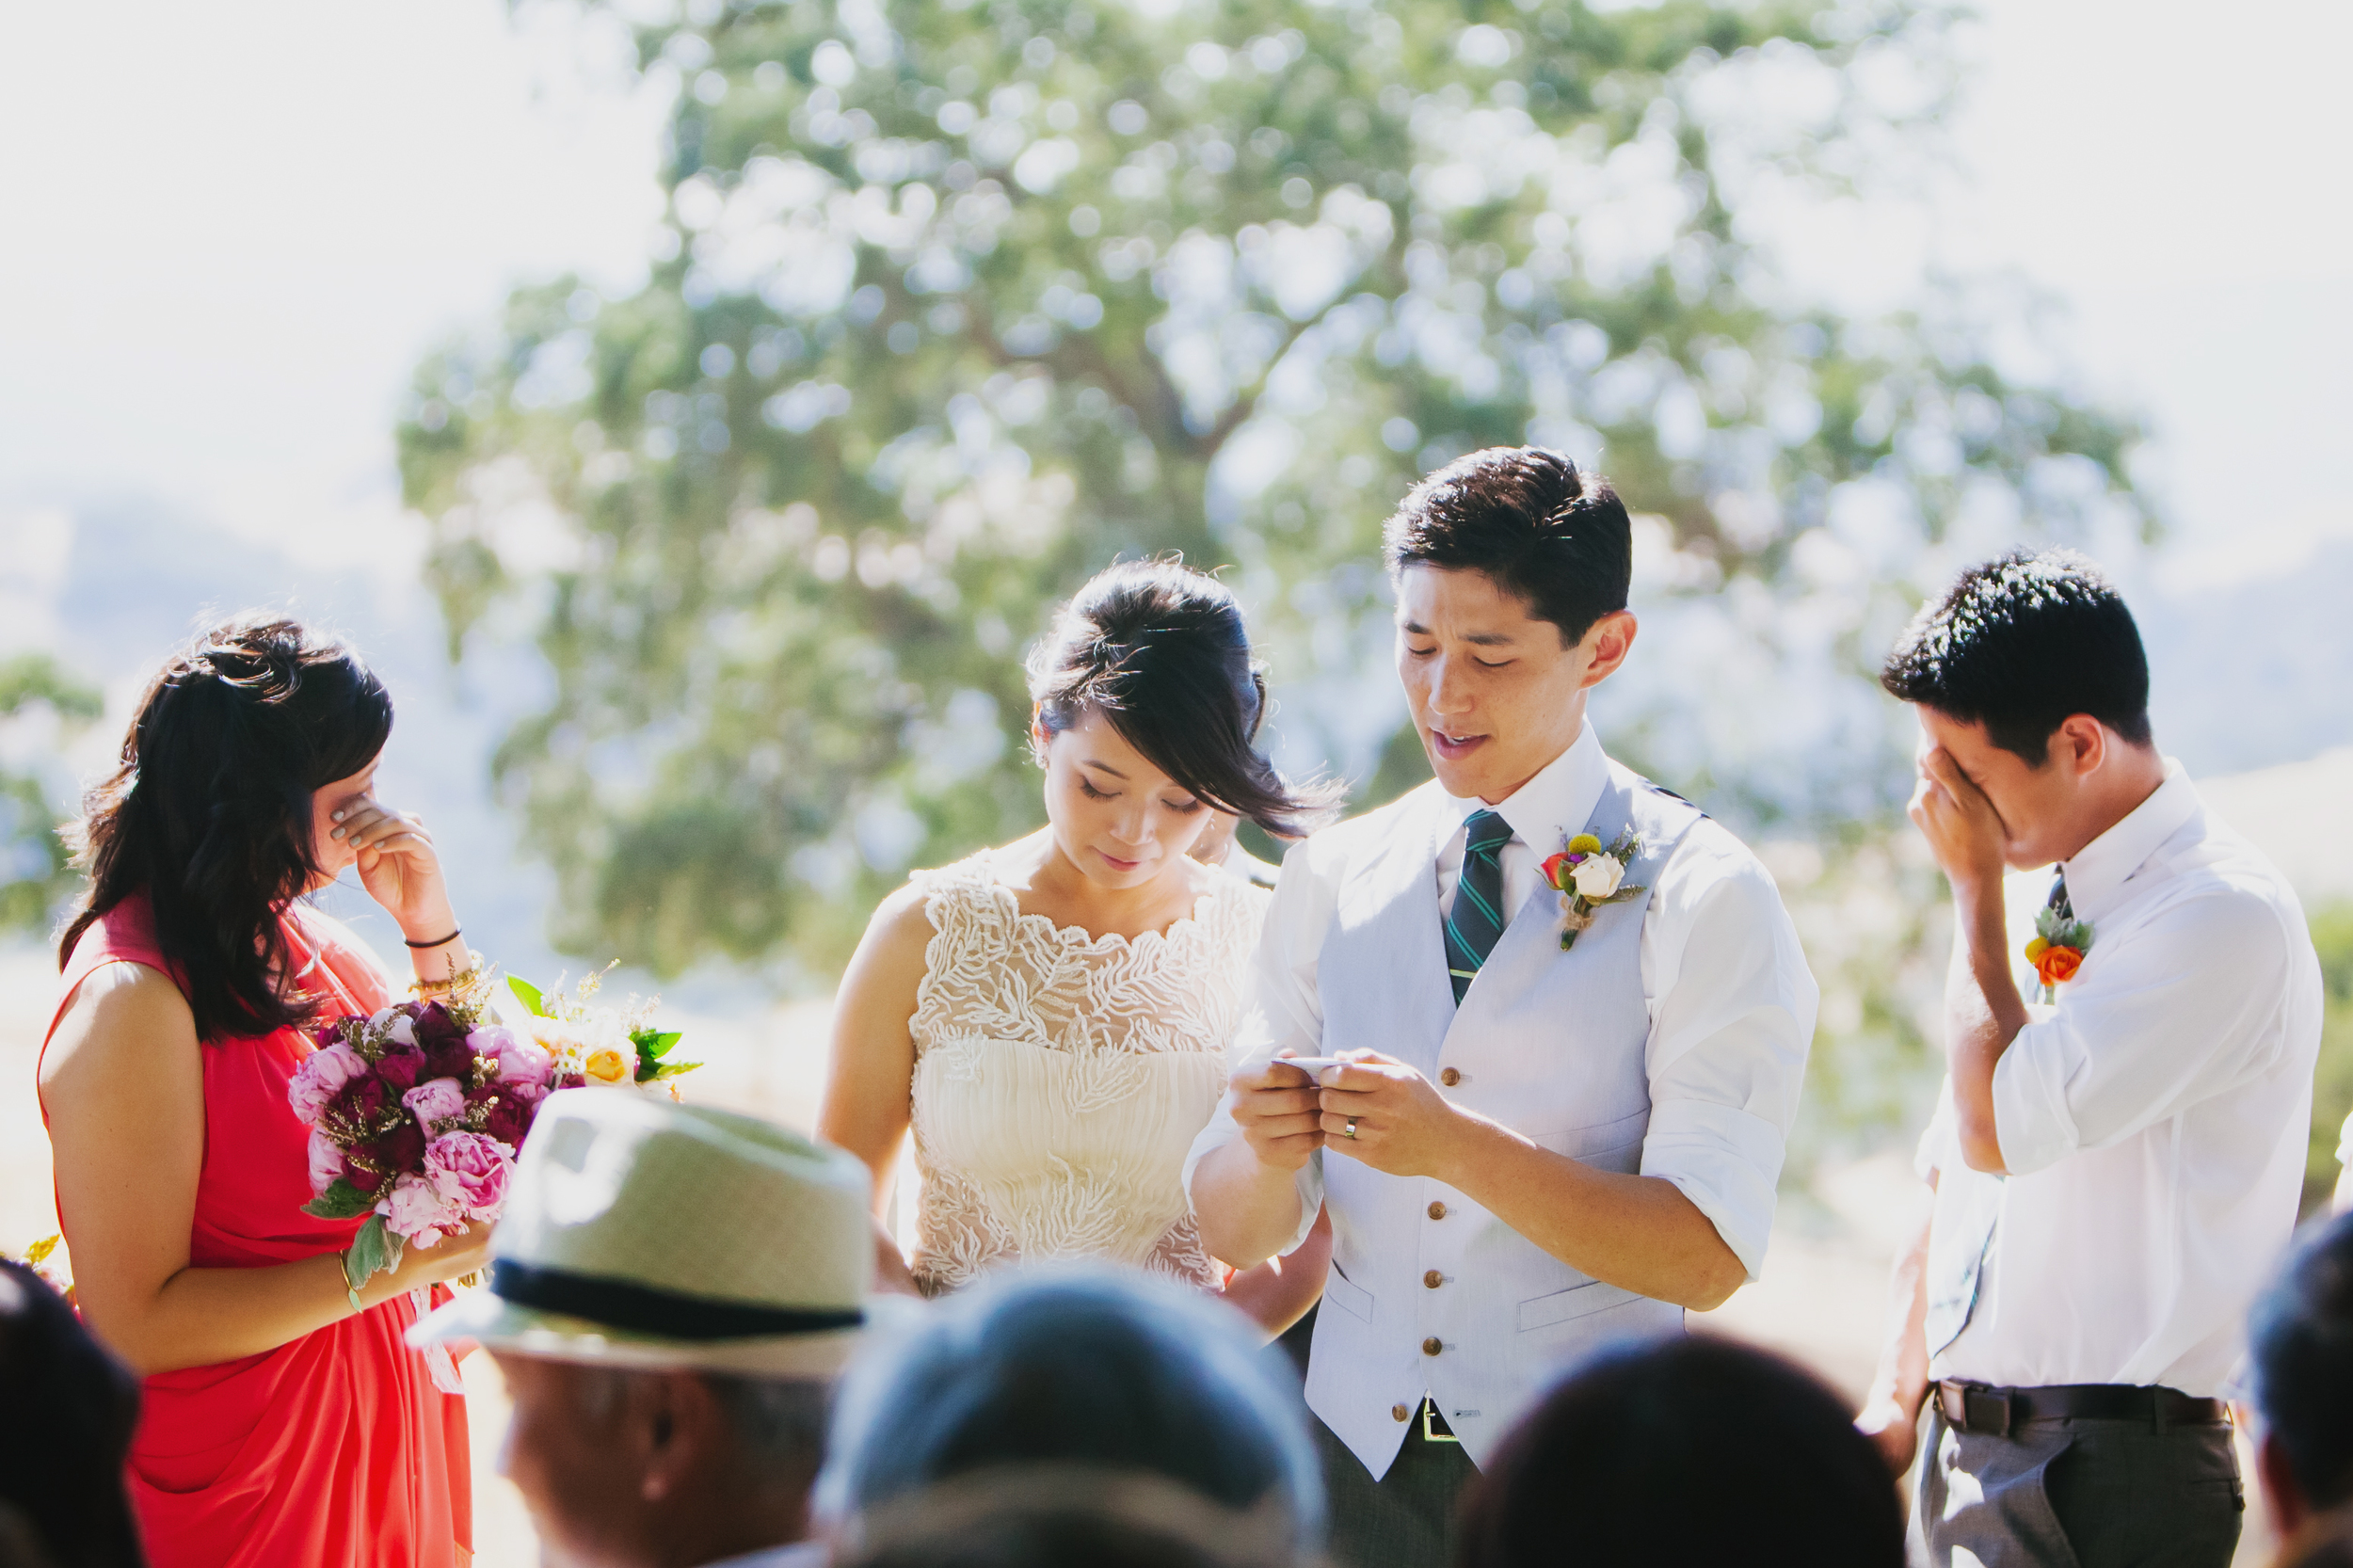 Diablo_Ranch_Wedding_Photography_Becky_Will-17.JPG